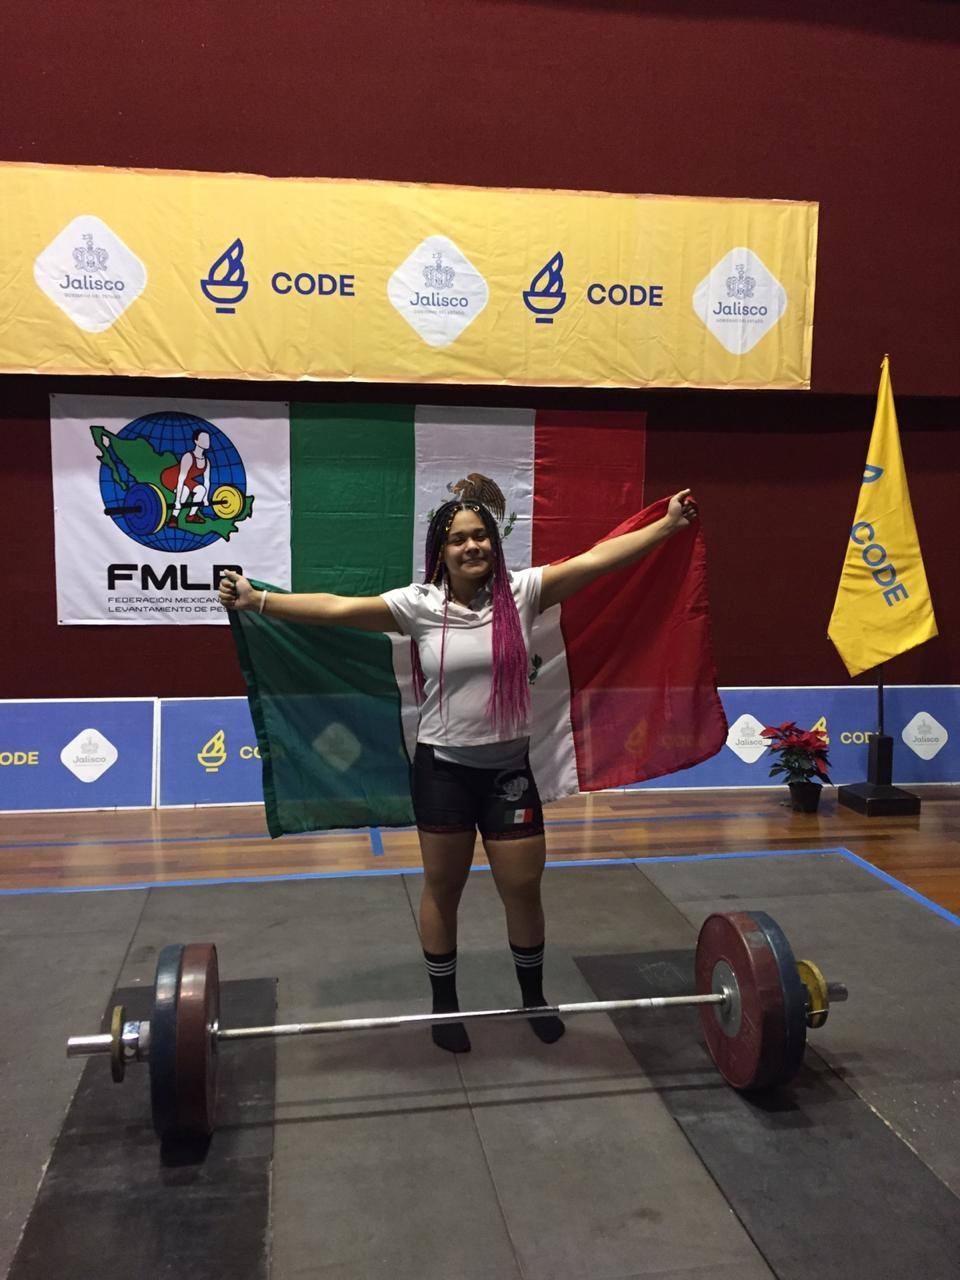 /cms/uploads/image/file/617230/Foto_1_Campeonato_Mundial_Sub_17.jpeg